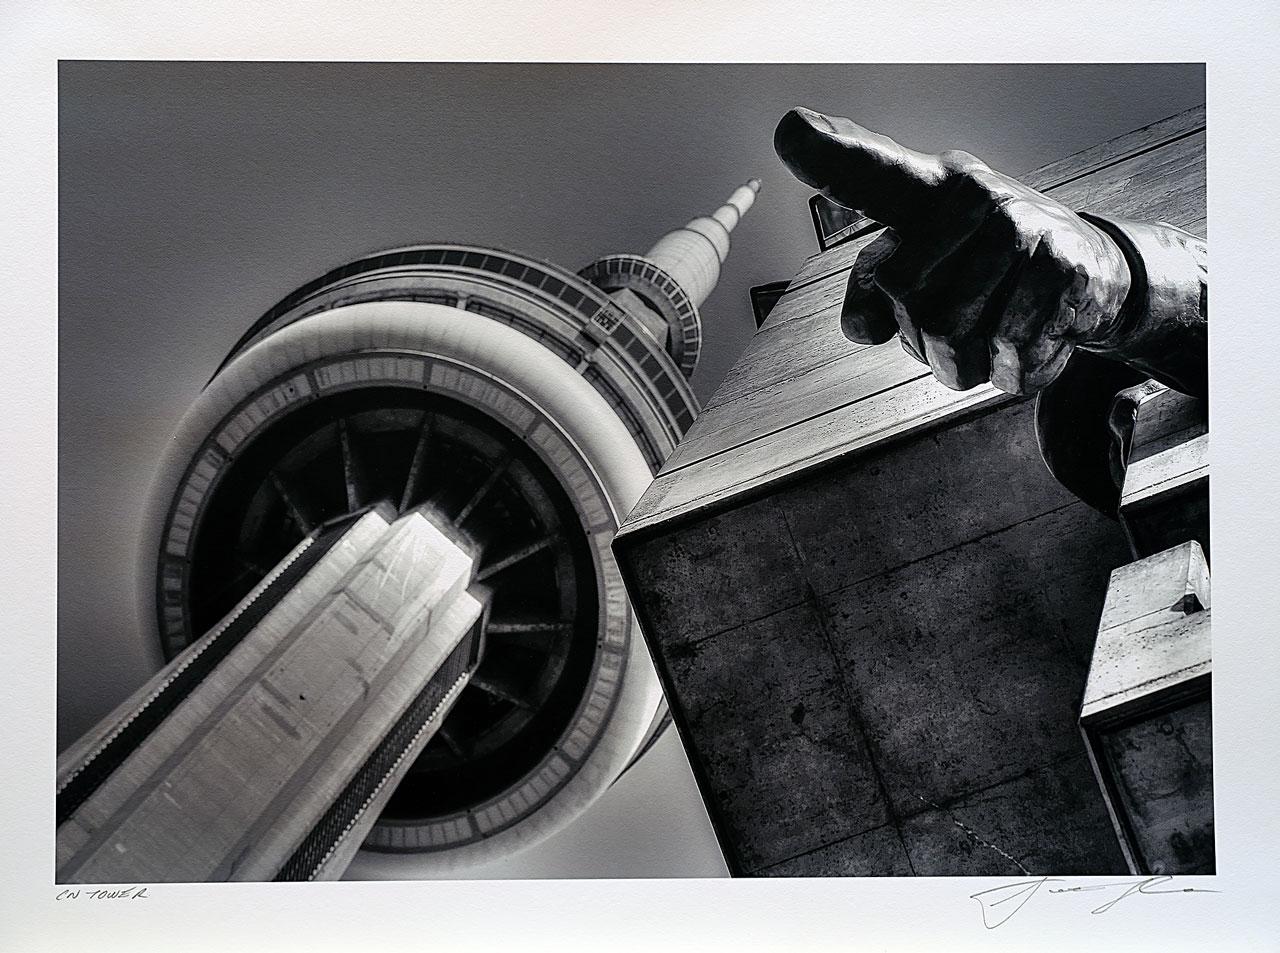 print-Canada-Ontario-Toronto-cn-tower